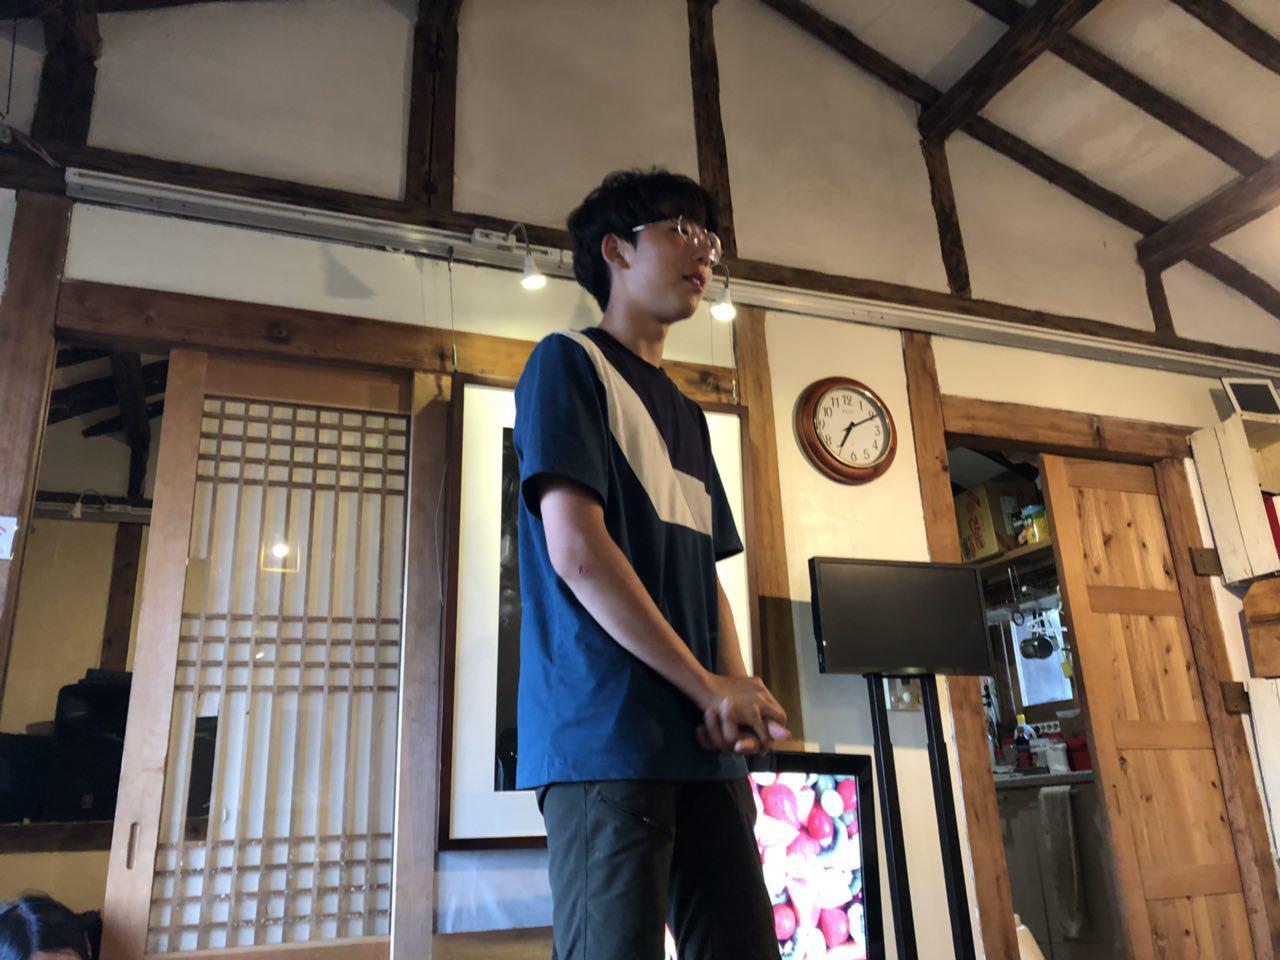 photo_2018-05-27_08-34-55.jpg